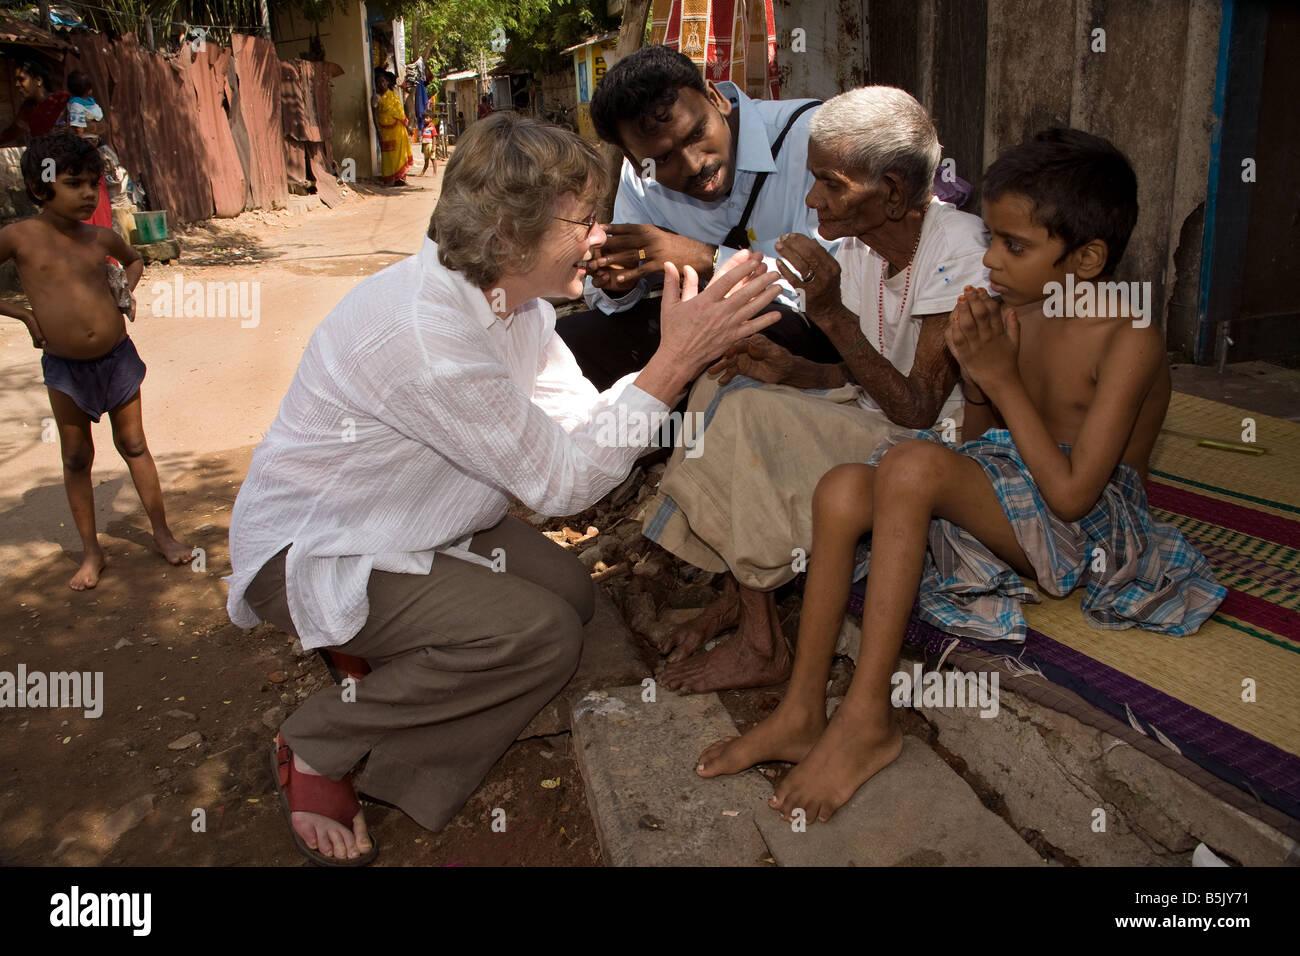 CelebrityJane Fernley-Whittingstall & HAI social worker Marimthu visit Mrs Mottaiamma 85 looking after great - Stock Image